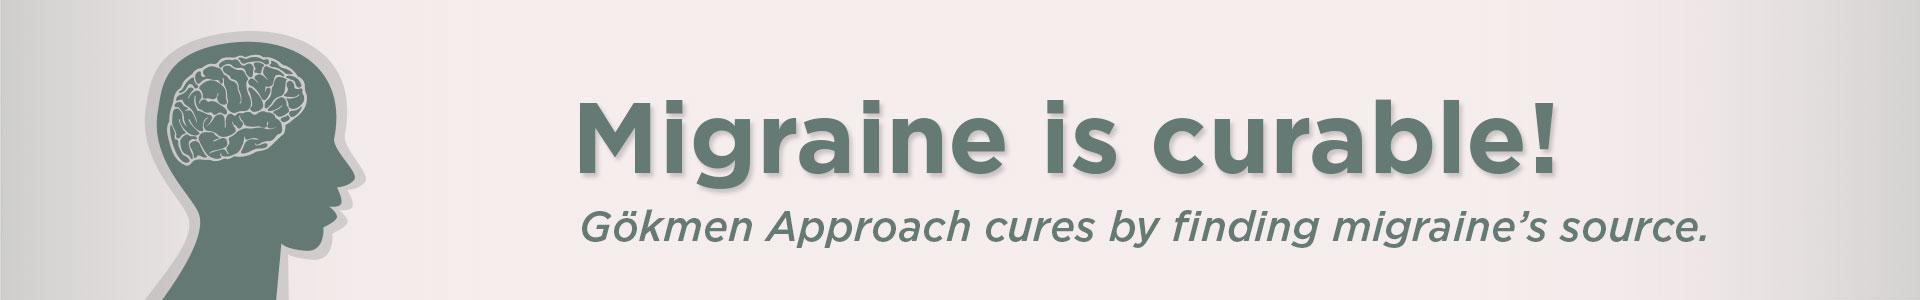 Migraine page header image Dr. Emel Gokmen